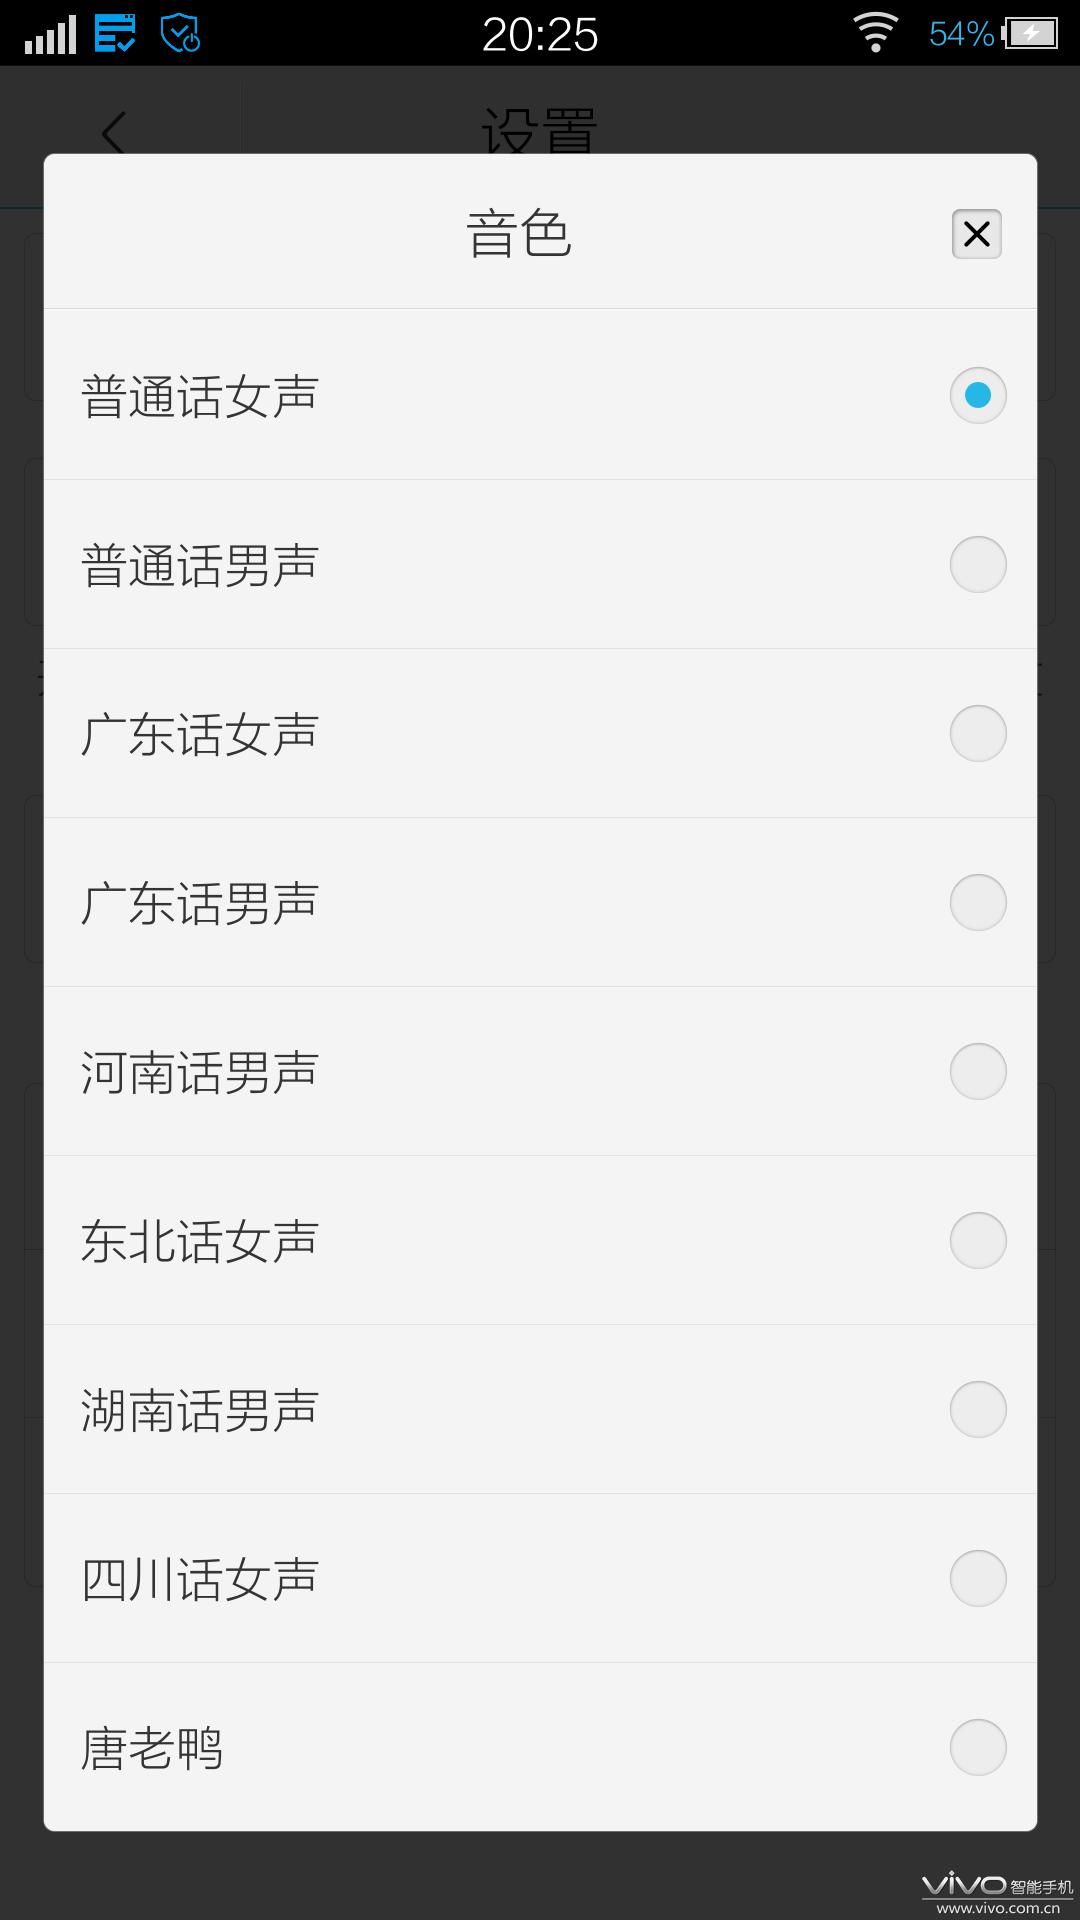 vivoice有多种语音选项.桌面图标官方后面也会更新